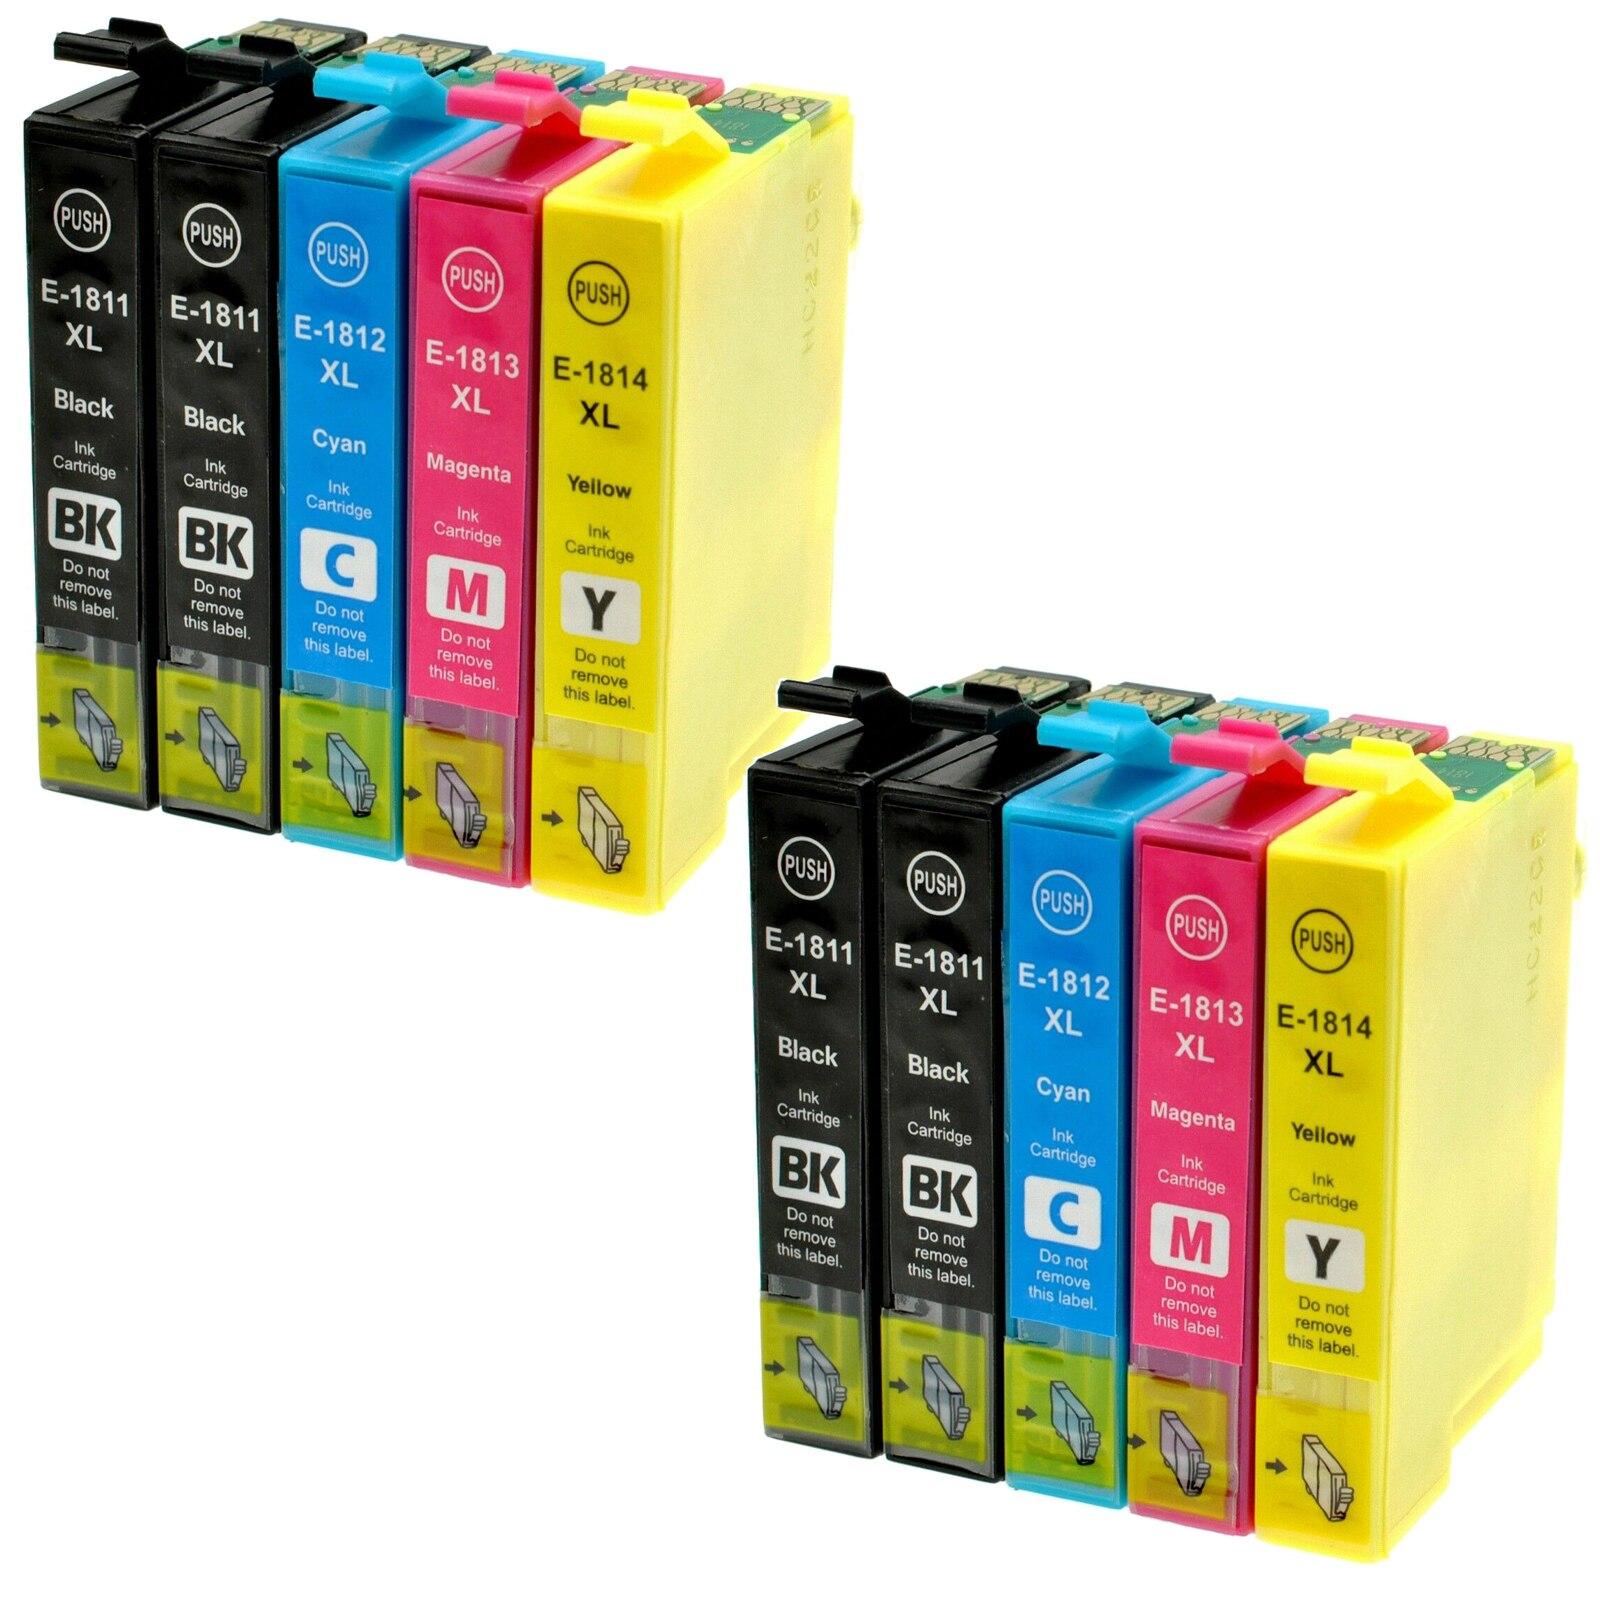 10 cartriges الحبر T18XL نموذج T 18XL t1811 t1812 t1813 t1814 متوافق مع epson طابعات XP102 XP202 XP205 XP30 XP212